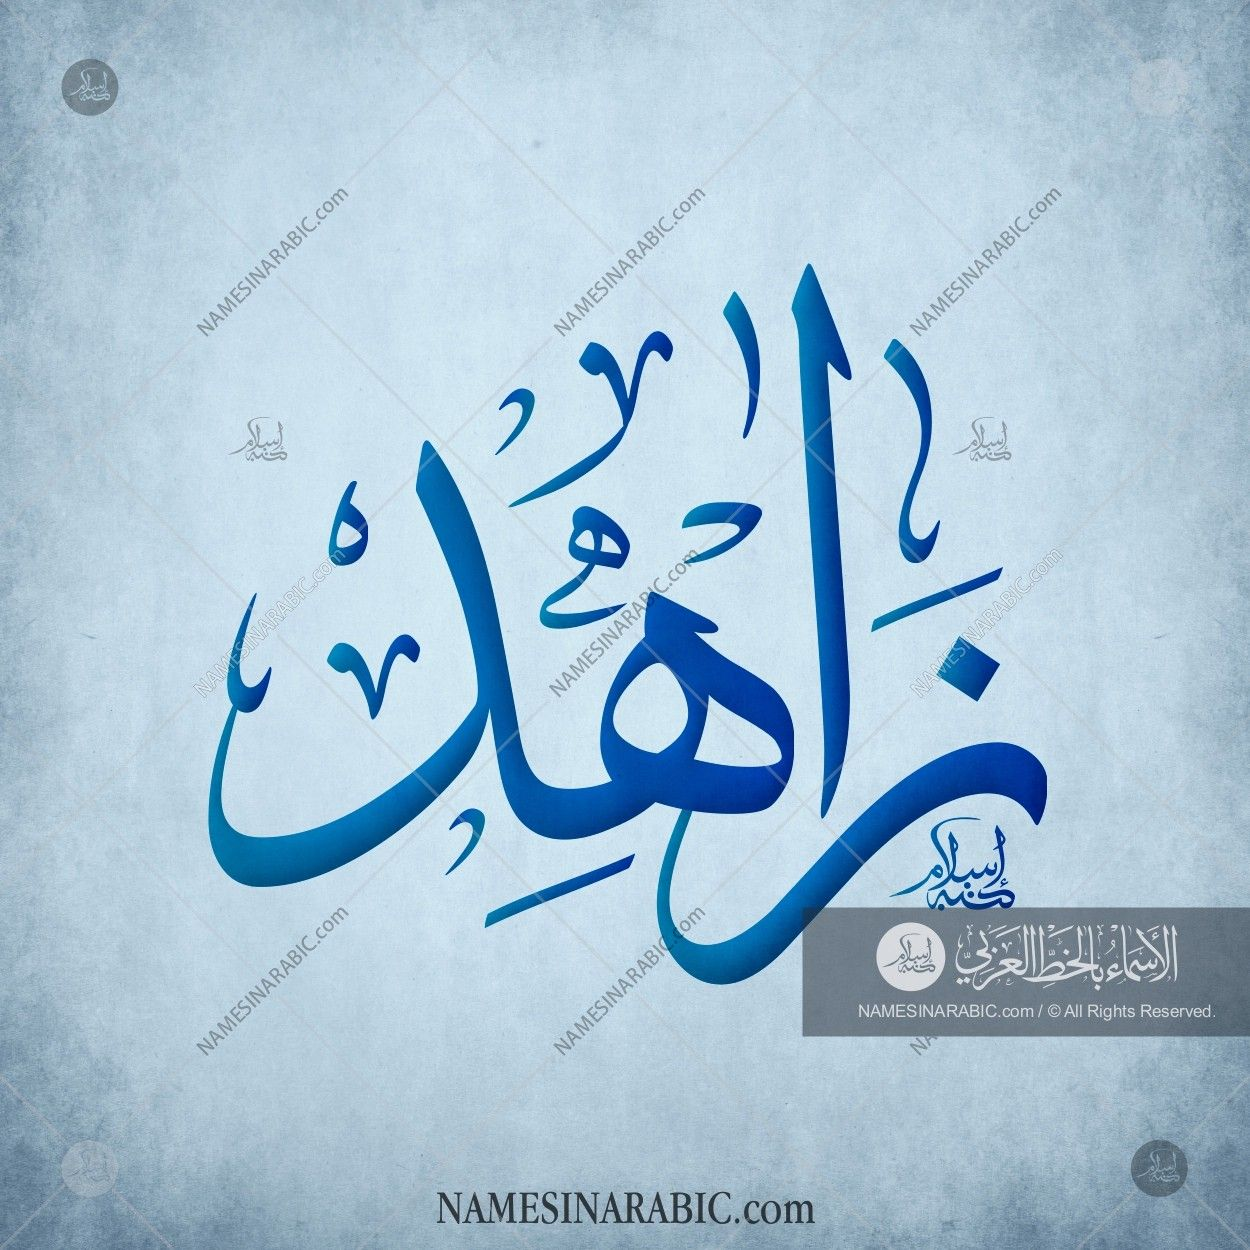 Zahid زاهد Names In Arabic Calligraphy Name 3569 Calligraphy Name Calligraphy How To Write Calligraphy